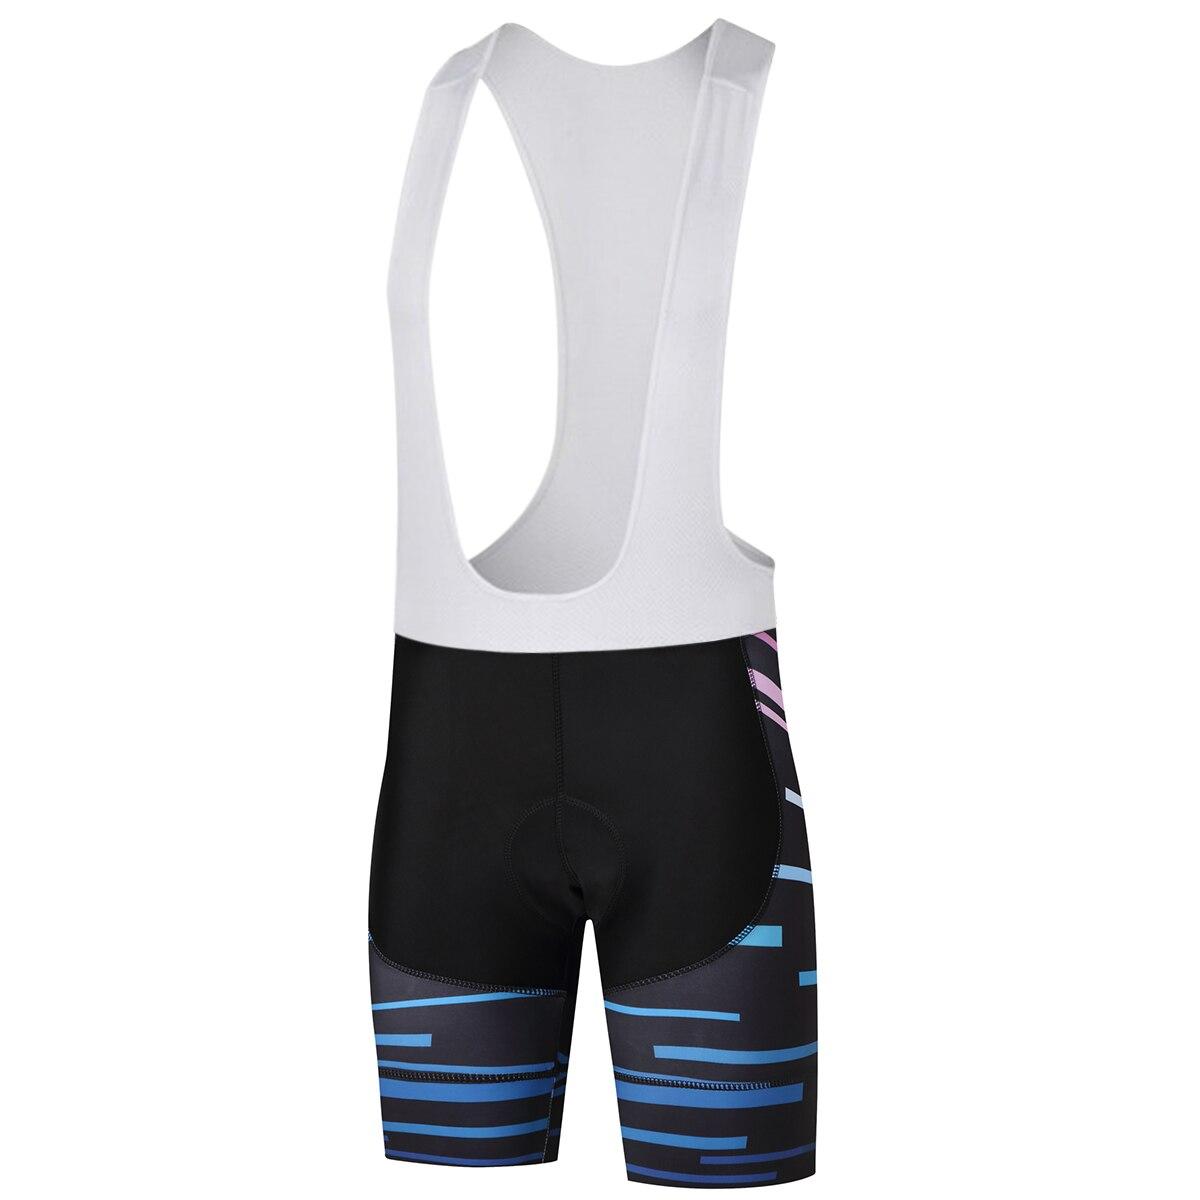 New 2018 Fast drying Men's Cycling bib Shorts 9D Gel Pad Summer Team Bicycle Bib Shorts Cycling Shorts Breathable